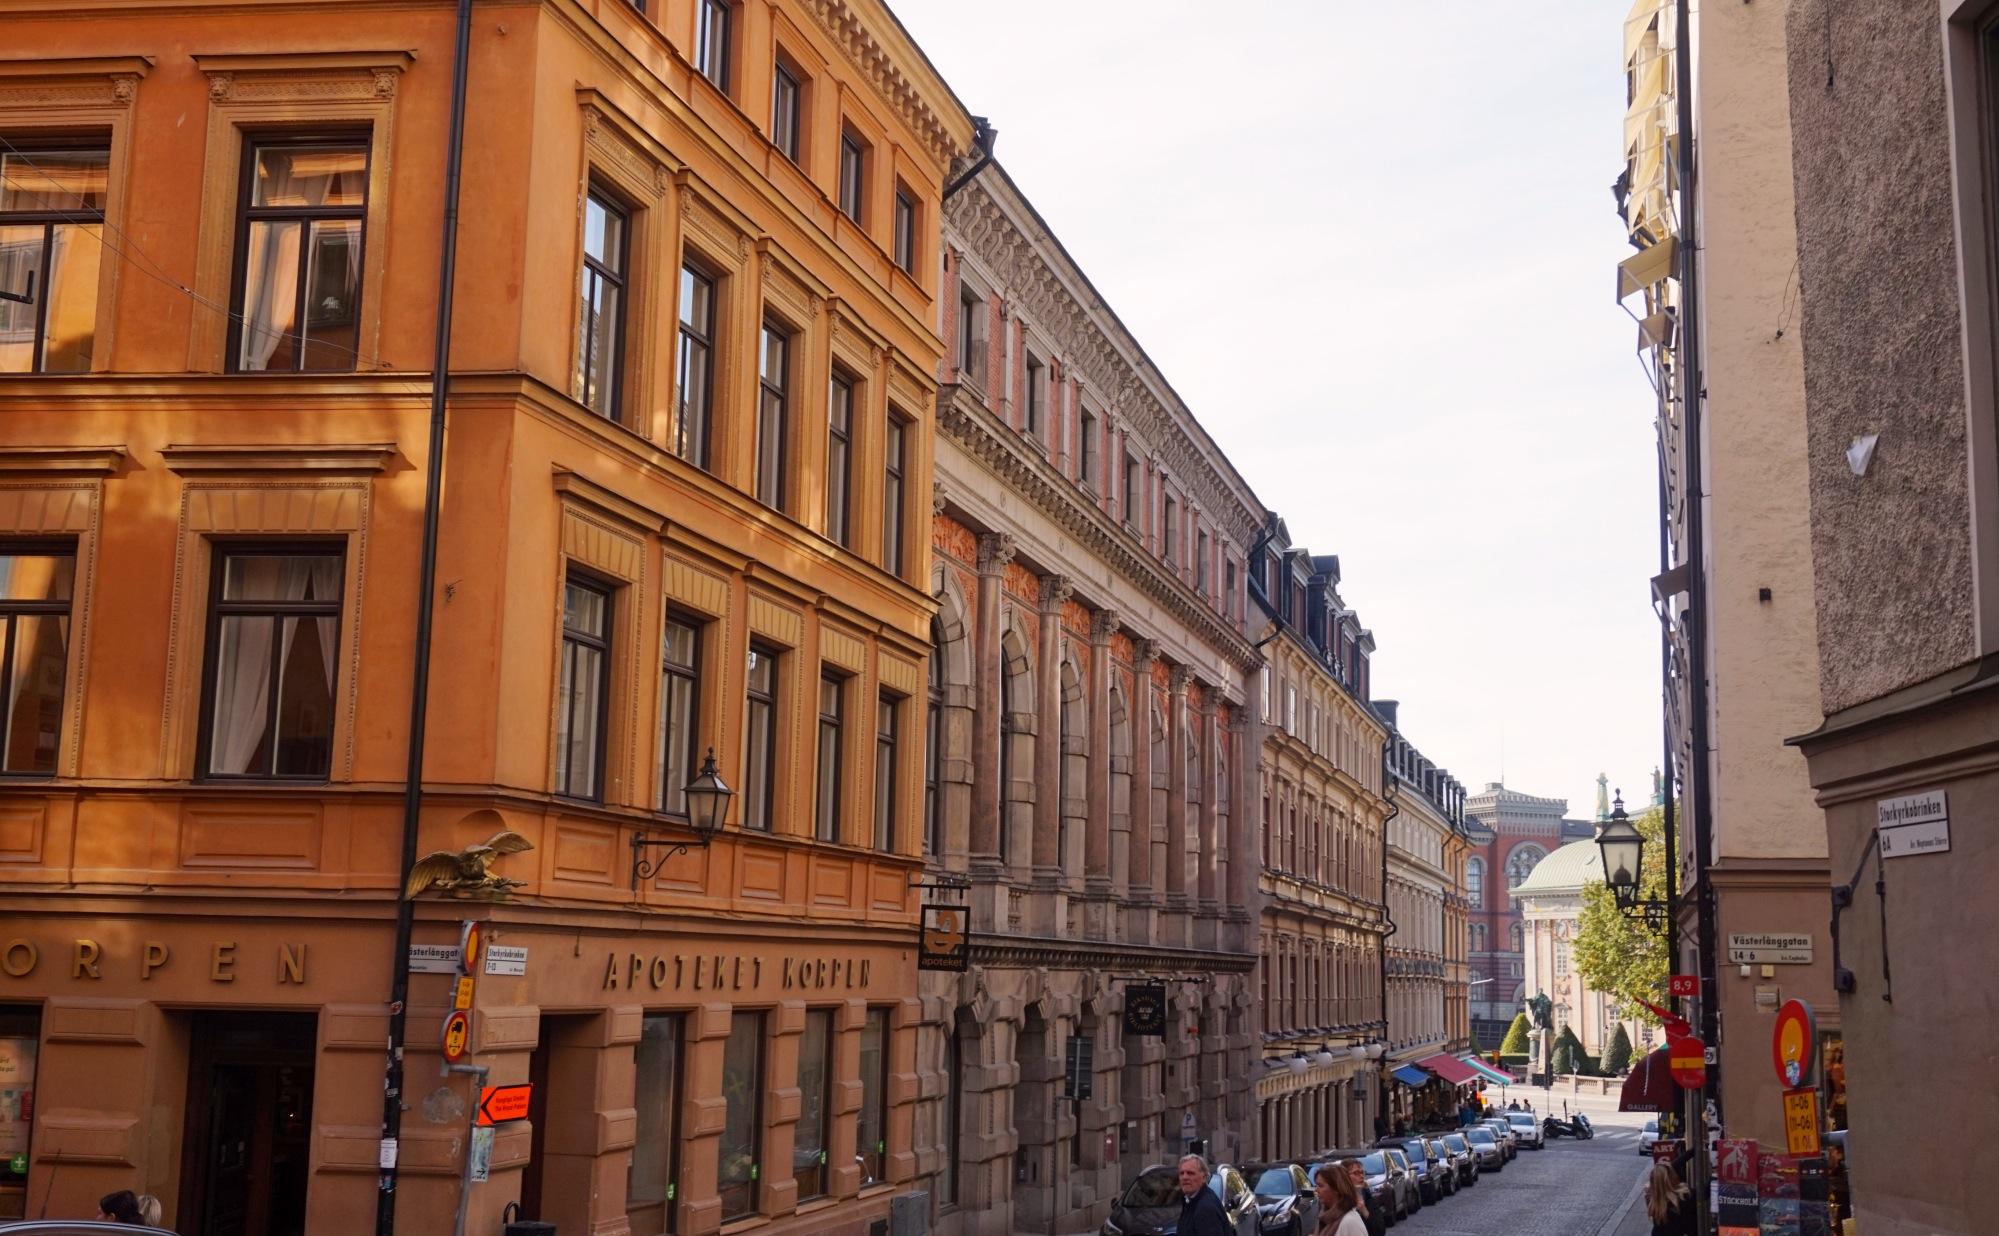 3-jours-a-stockholm-46